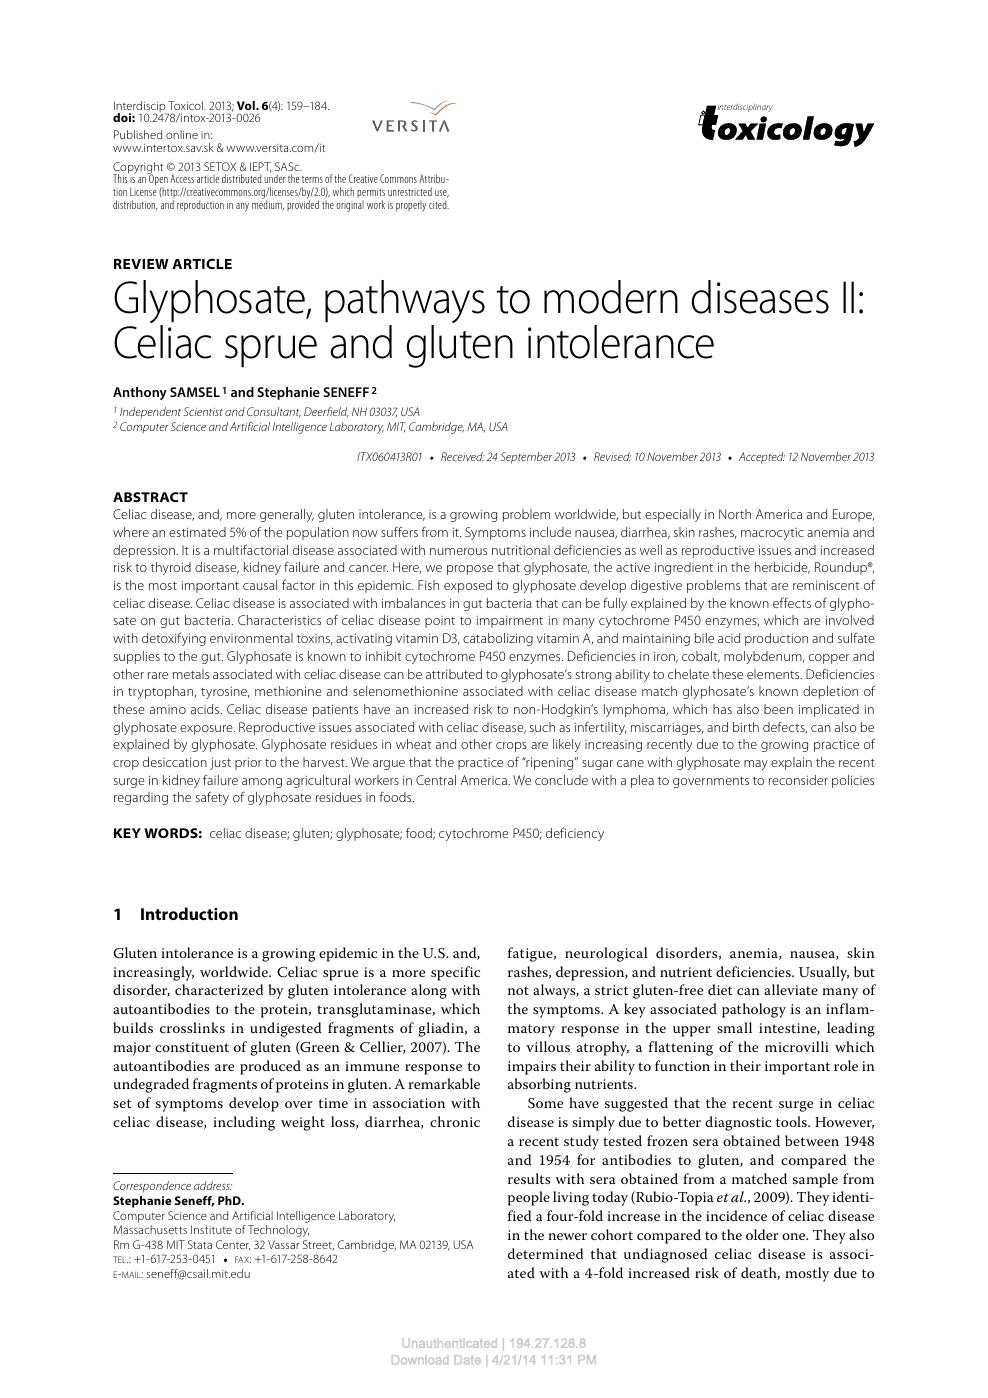 Glyphosate, pathways to modern diseases II: Celiac sprue and